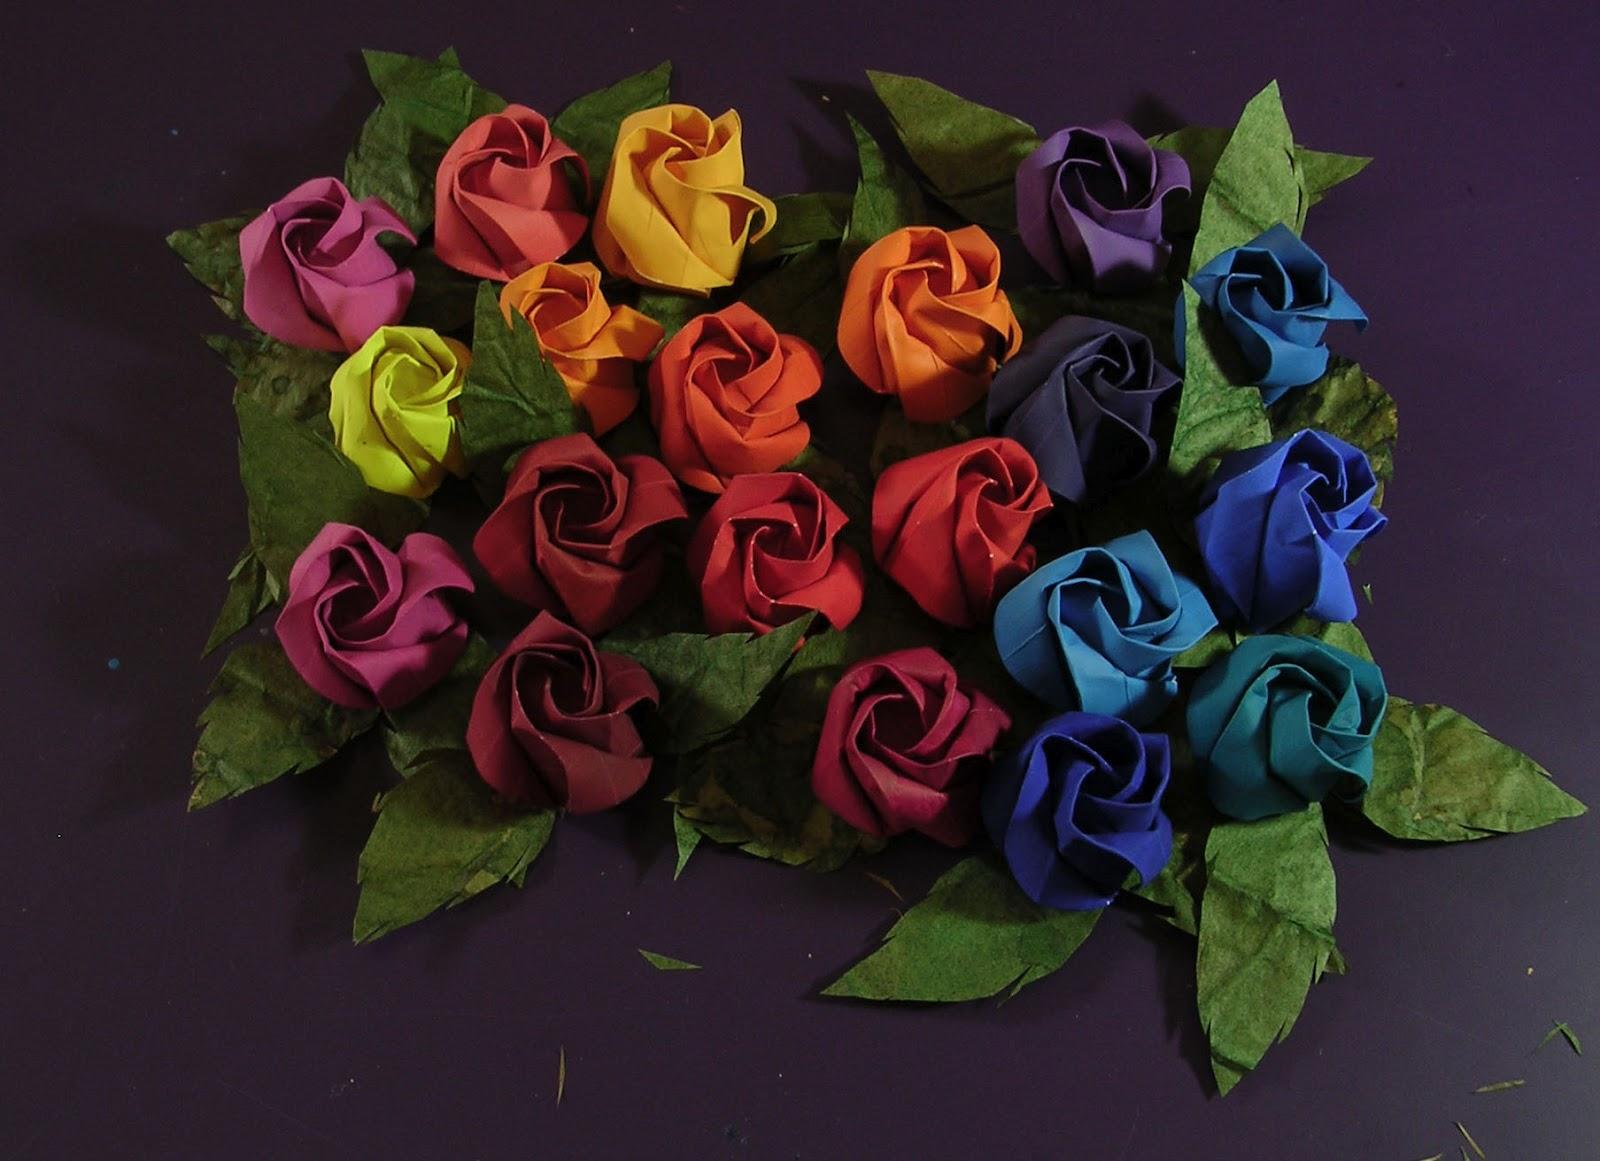 Origami rainbow roses how to make it httpbloom4ever origami rainbow roses how to make it httpbloom4everhowto origami rosep jeuxipadfo Choice Image